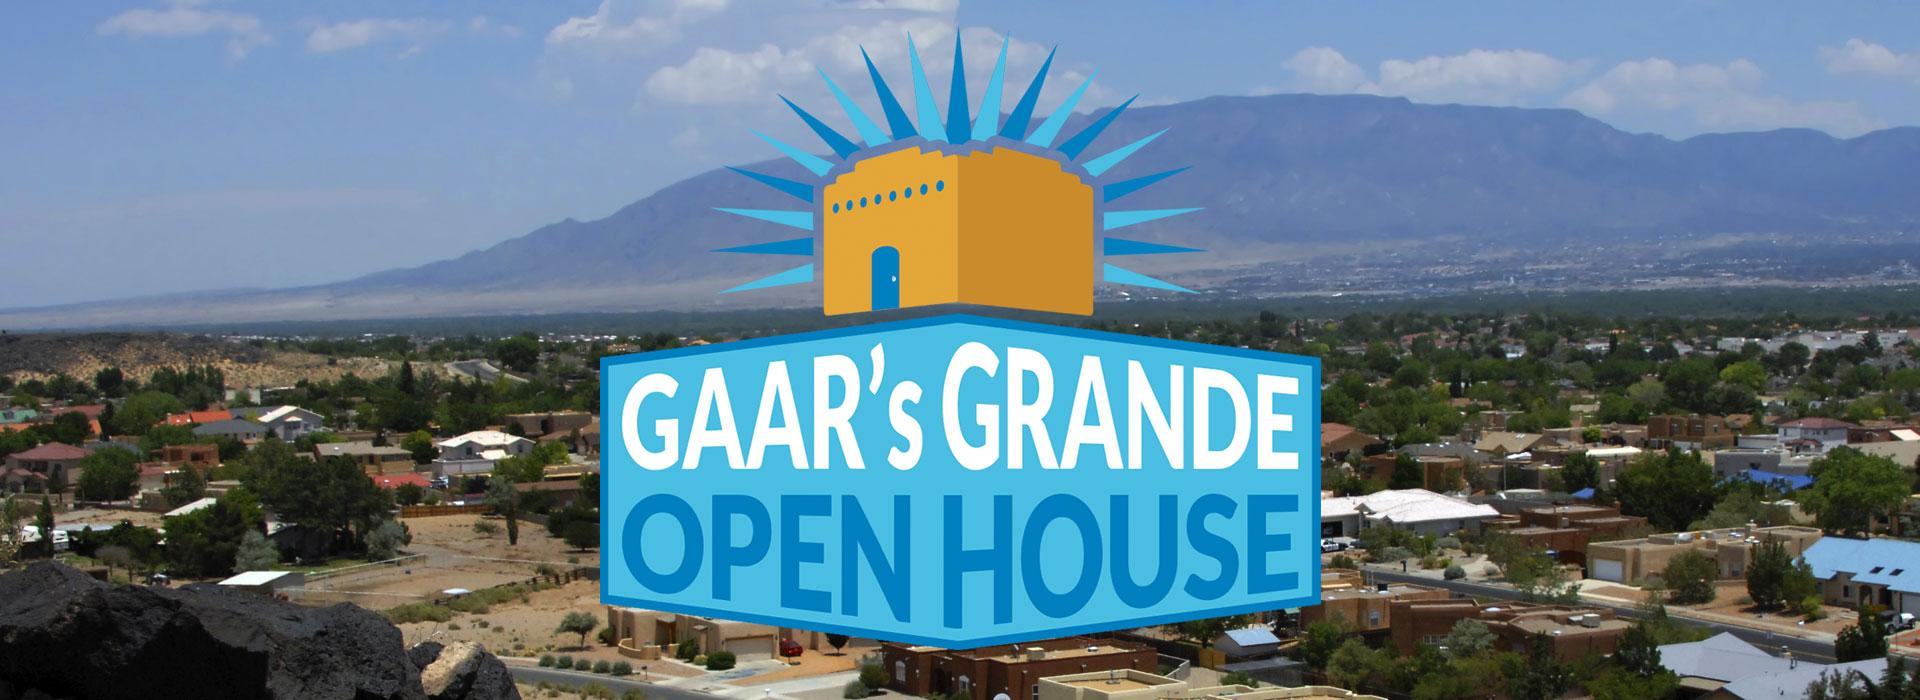 GAAR's Grande Open House Weekend